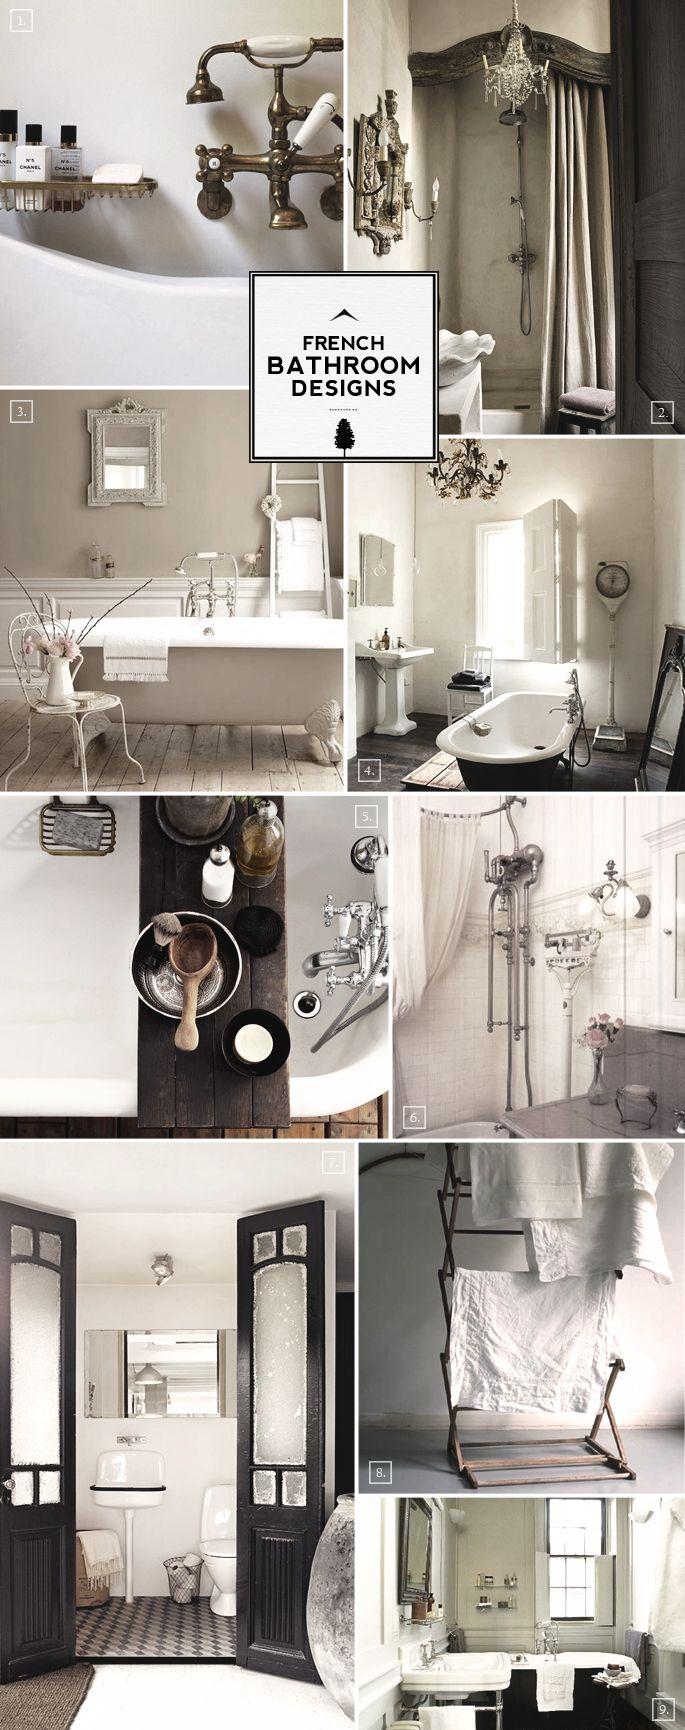 french style bathroom decor and designs | badezimmer dekor, stil